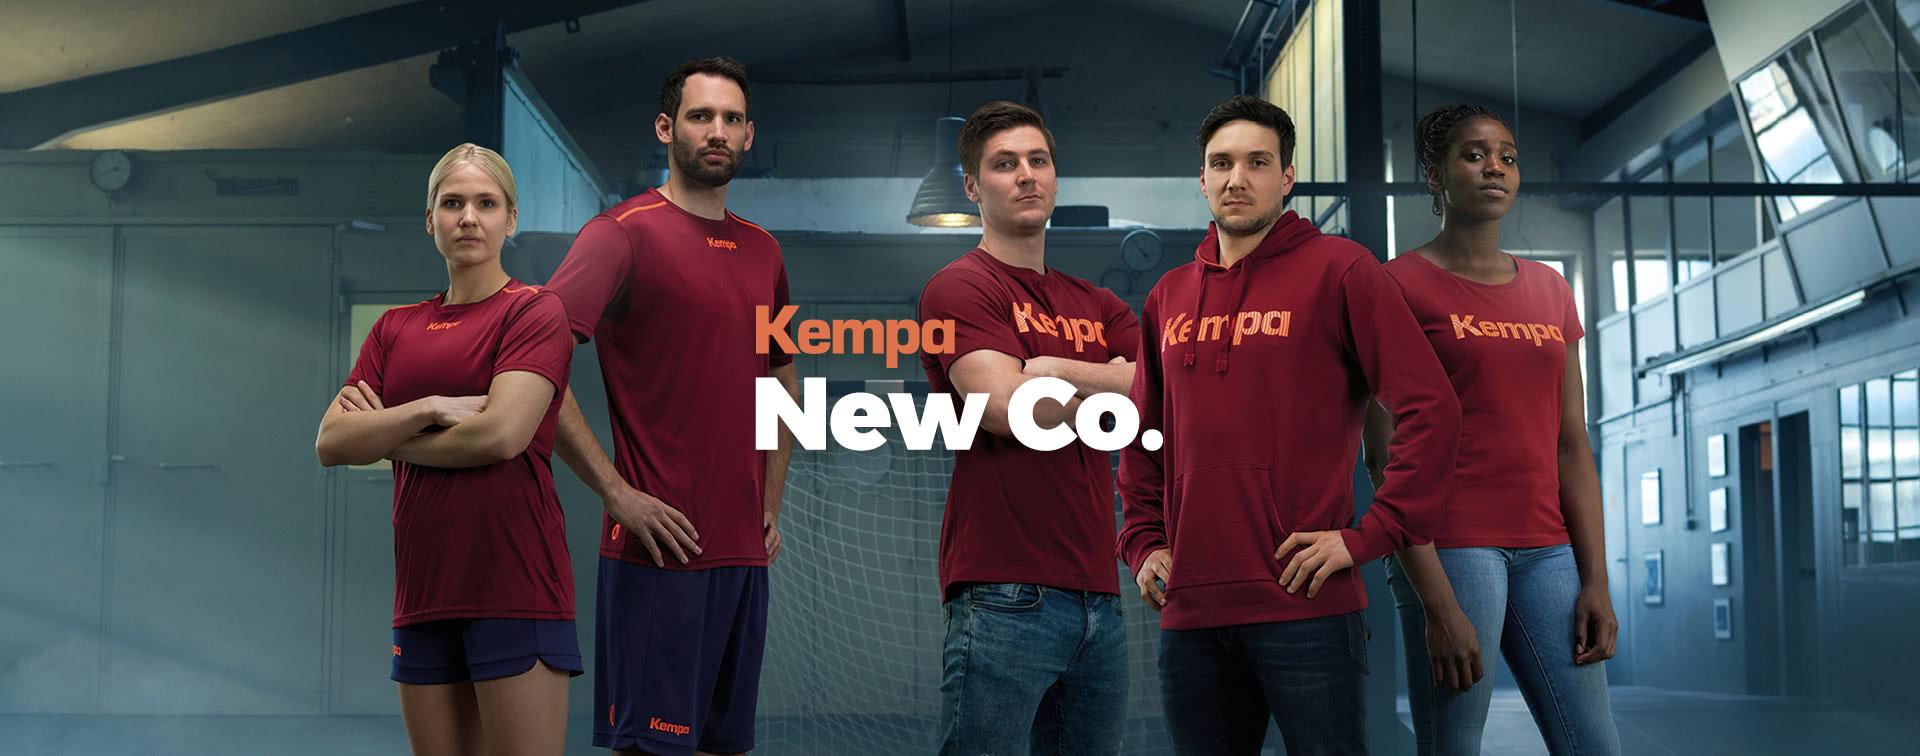 New kempa co